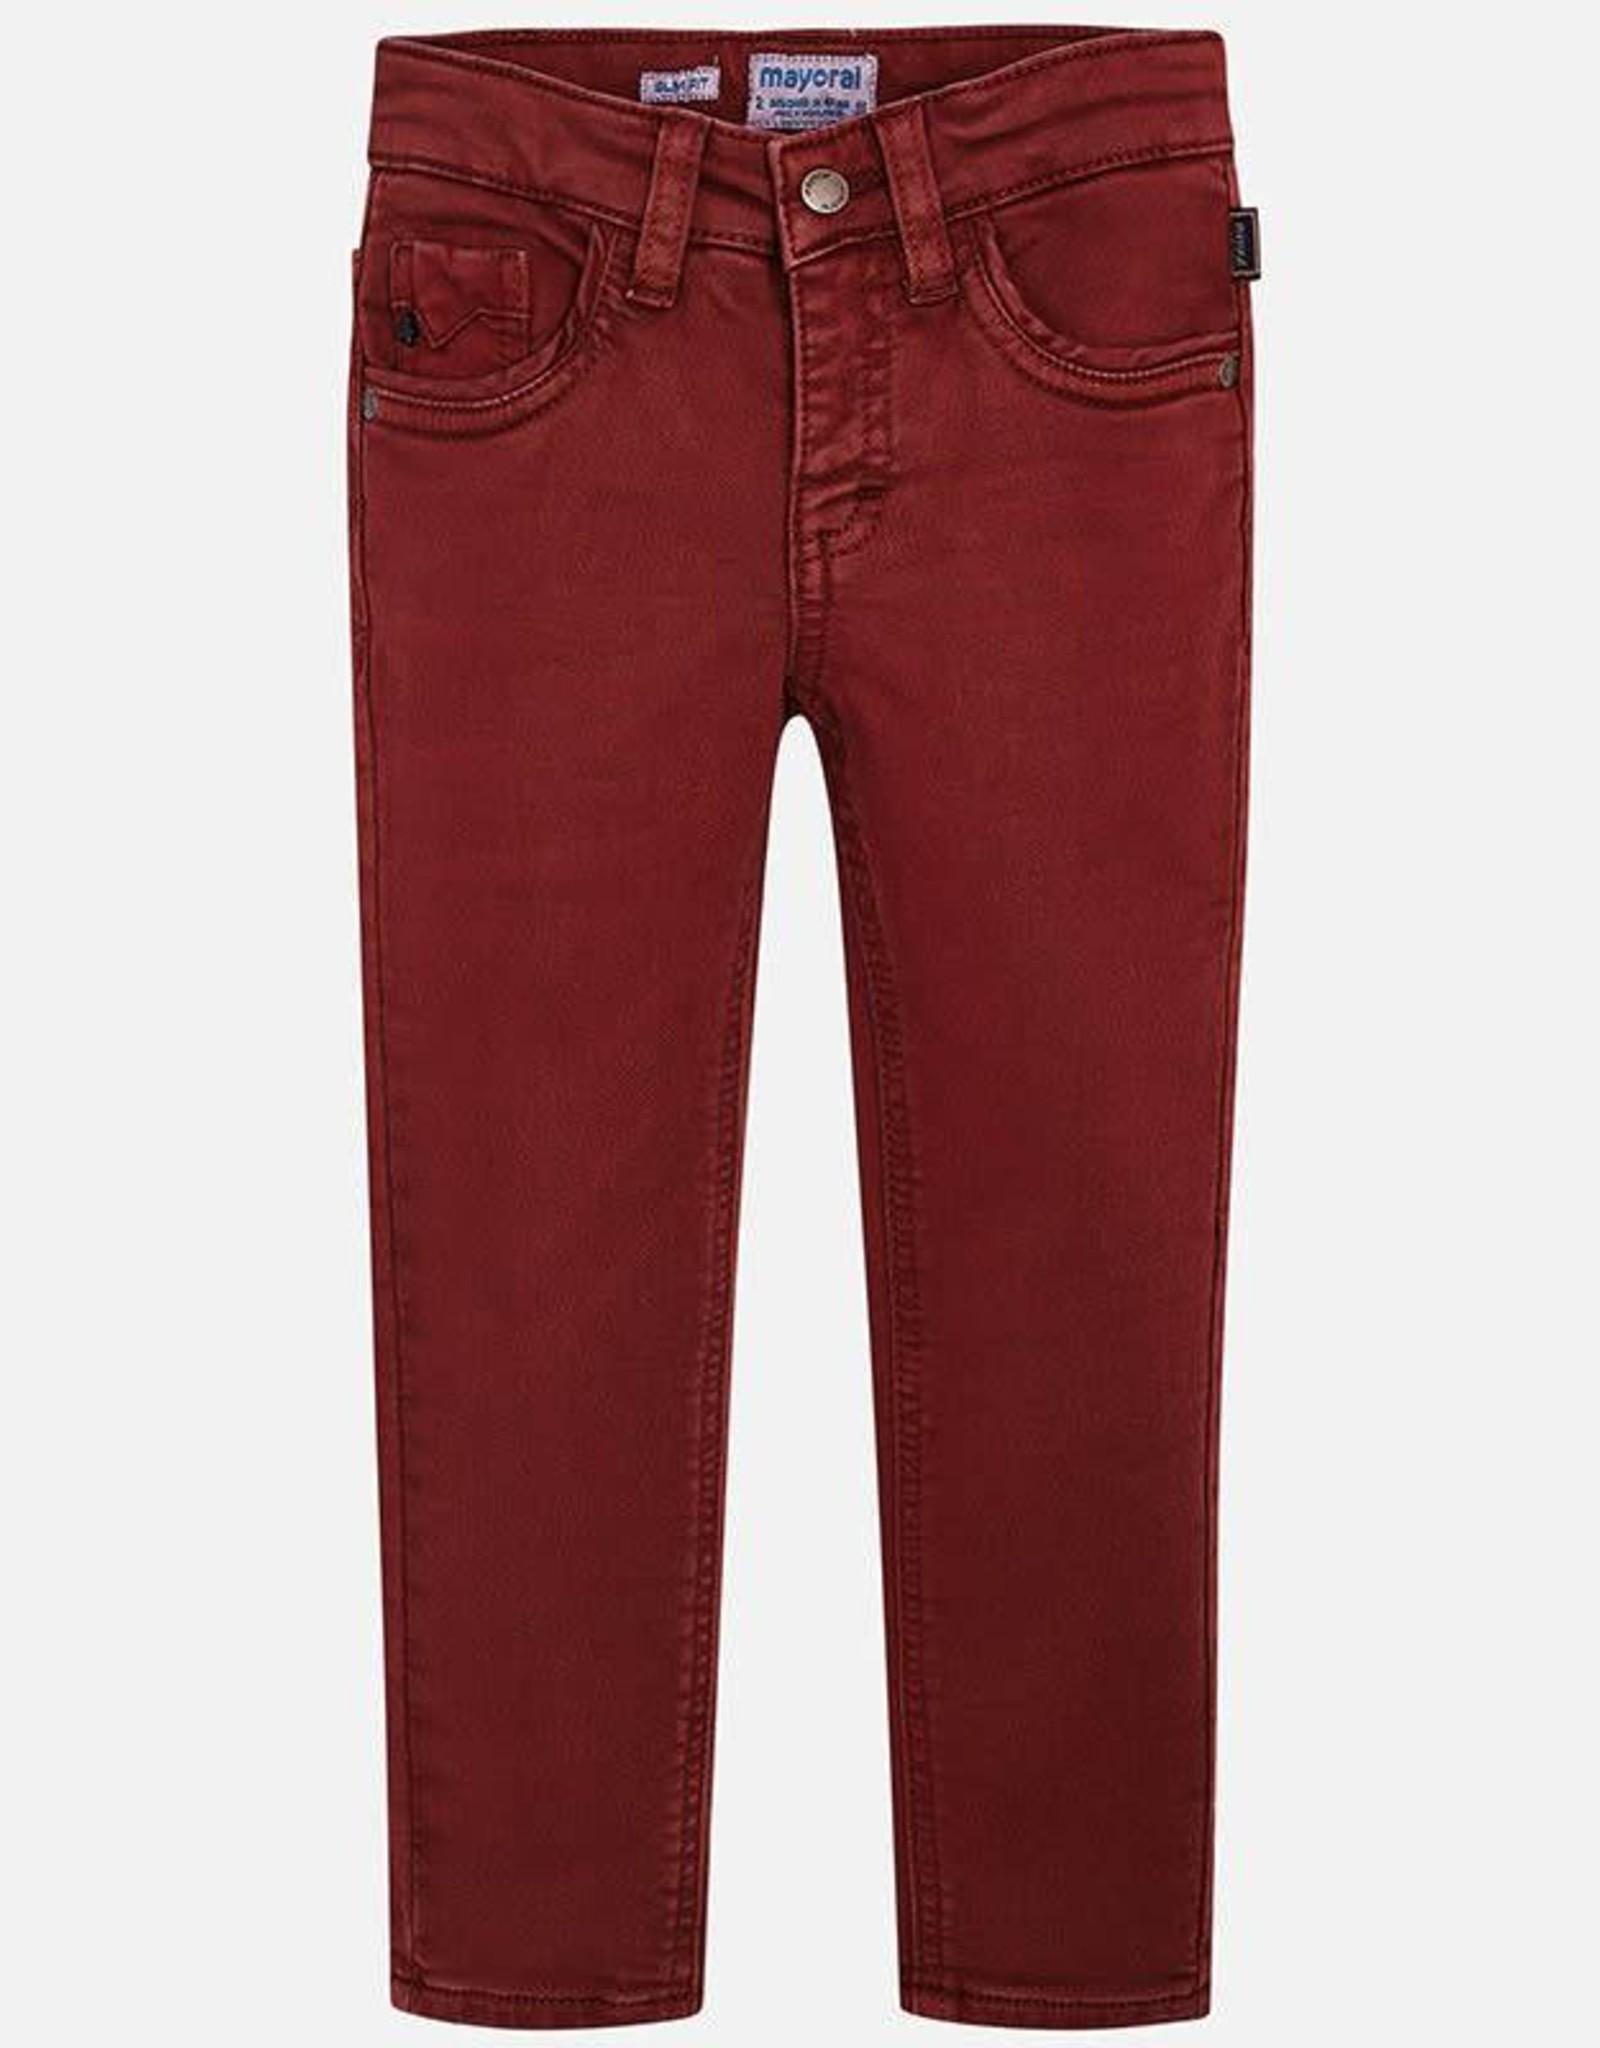 Mayoral Boys Burgundy Slim Fit Jeans